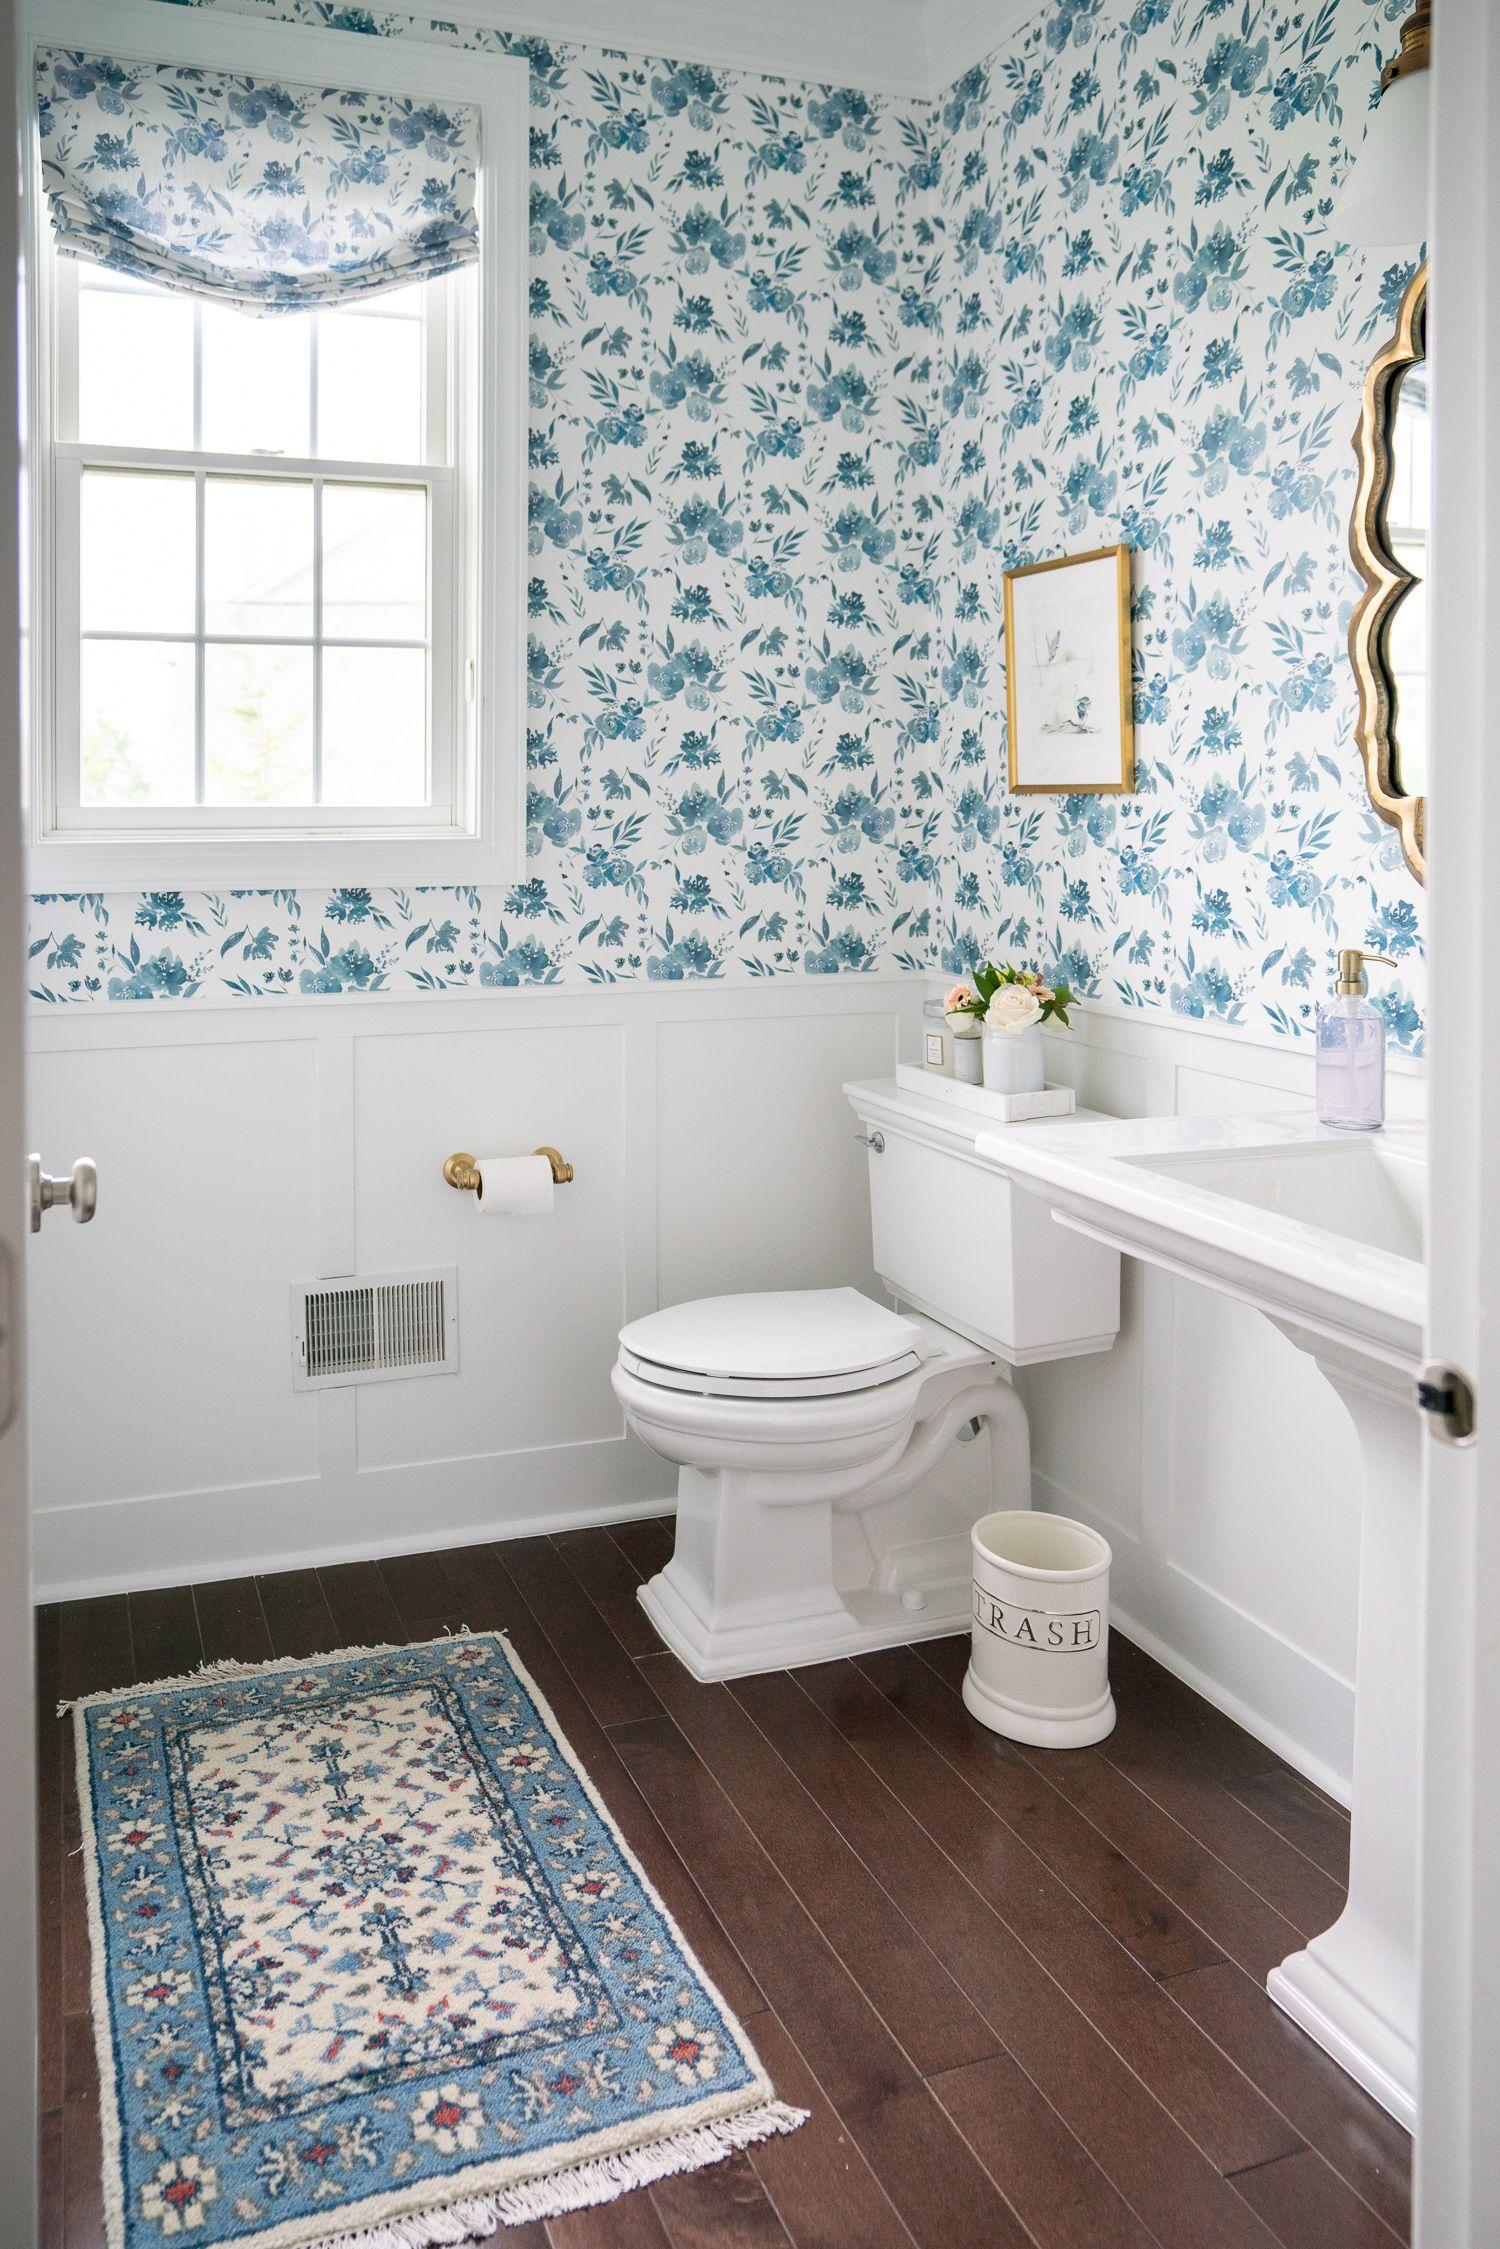 Powder Room Makeover Powder Room Makeover Caitlin Wilson Wallpaper Room Makeover Fashionable style bathroom wallpaper